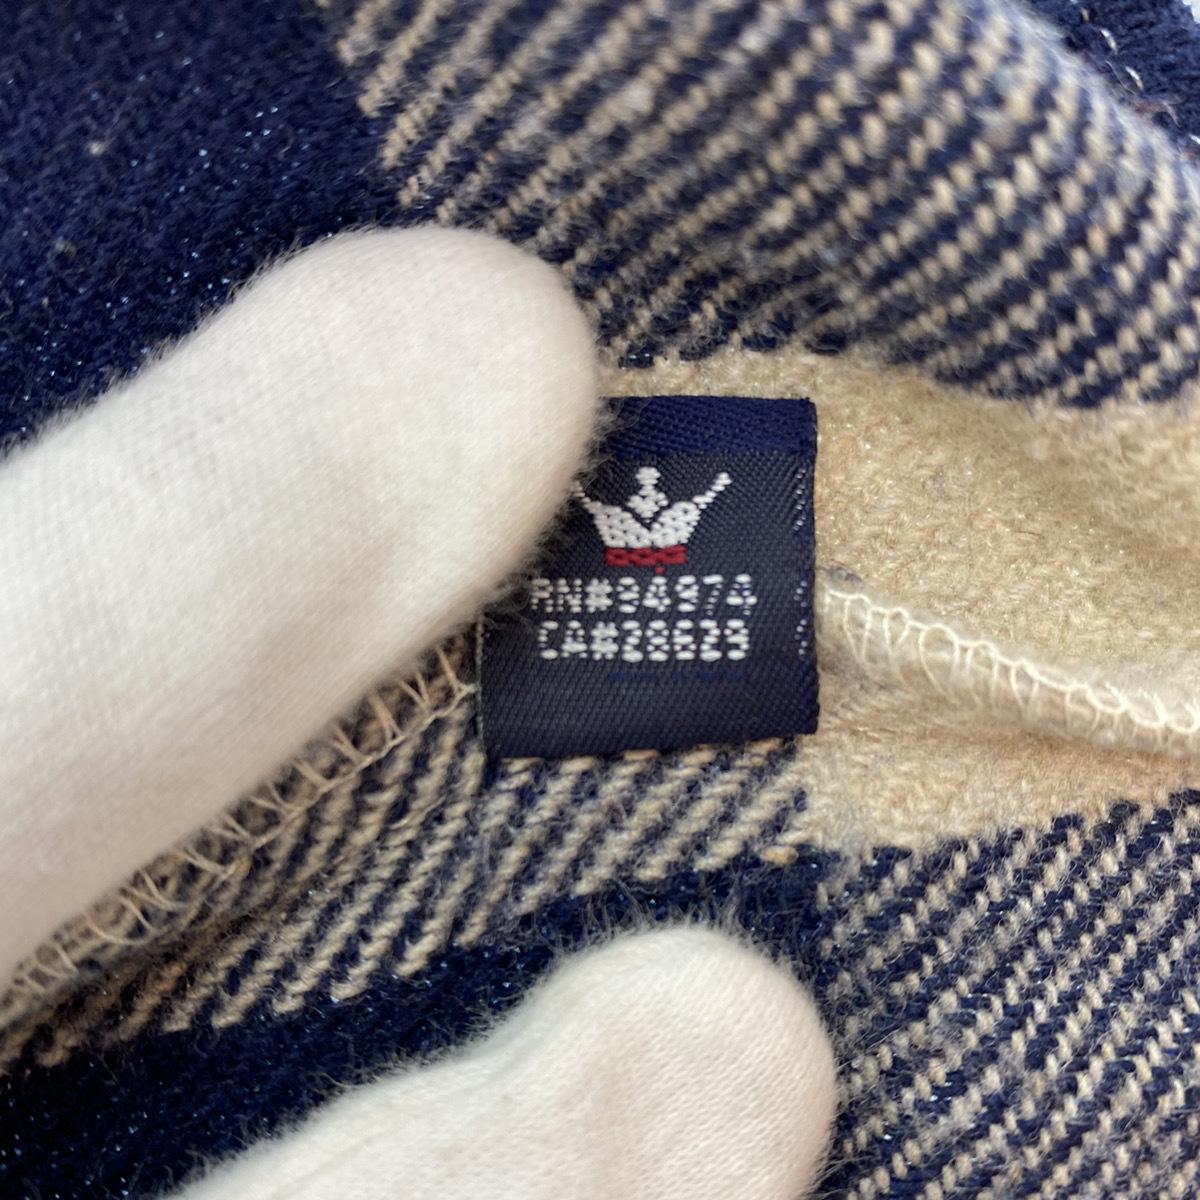 ●Stussy ステューシー OLD Stussy オールドステューシー 90s 90年代 紺タグ チェック ウール シャツ USA製 MADE IN USA 104_画像7